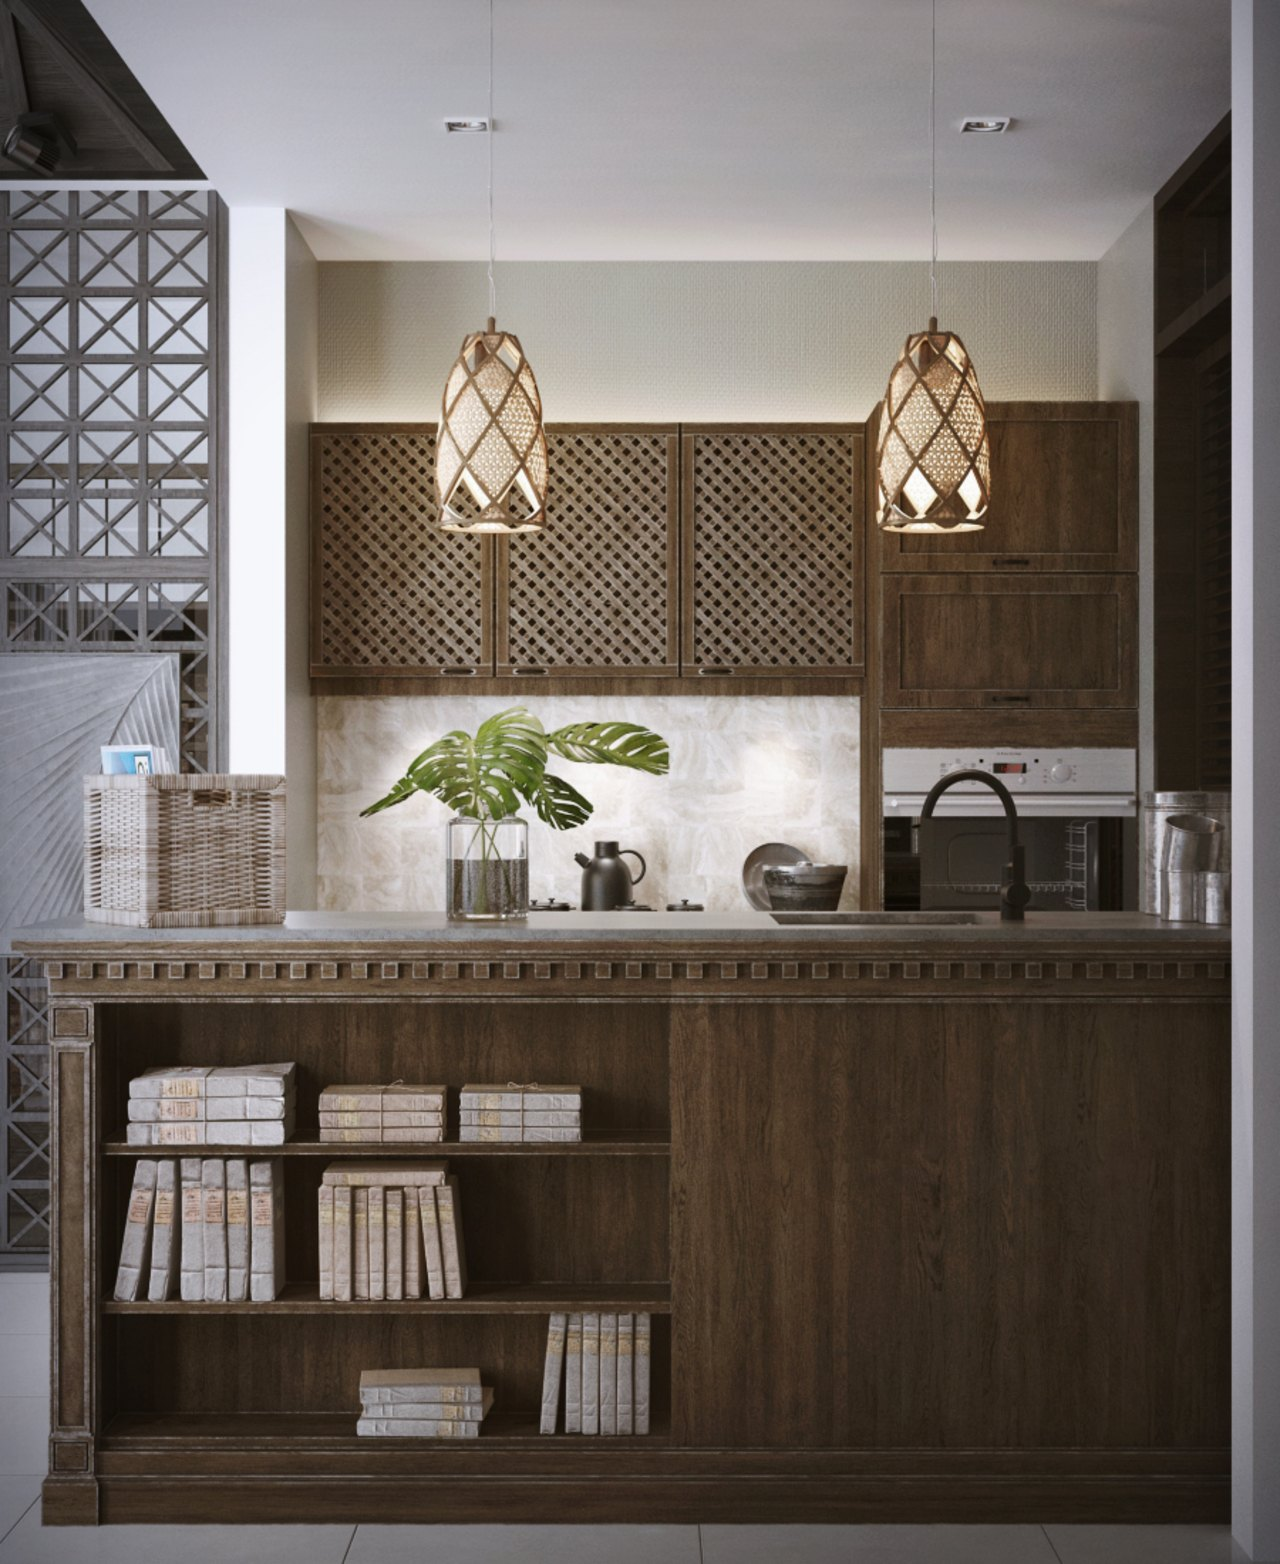 Interior Design The Light Collection III Penang Malaysia